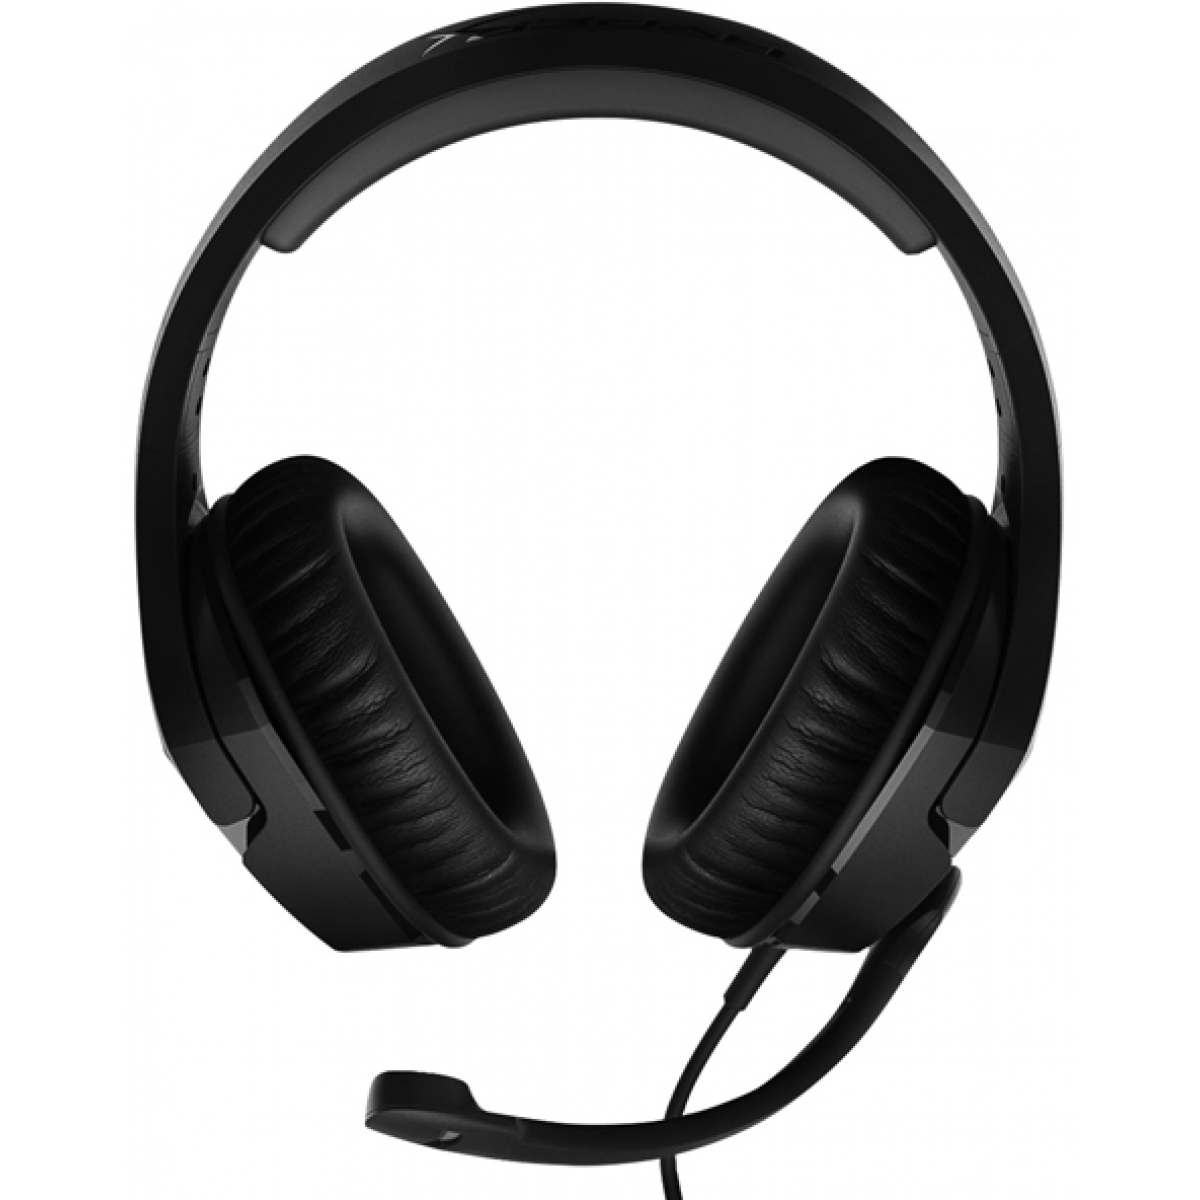 Headset Gamer HyperX Cloud Stinger, Drivers 50mm, Múltiplas Plataformas, P2 e P3, HX-HSCS-BK/NA